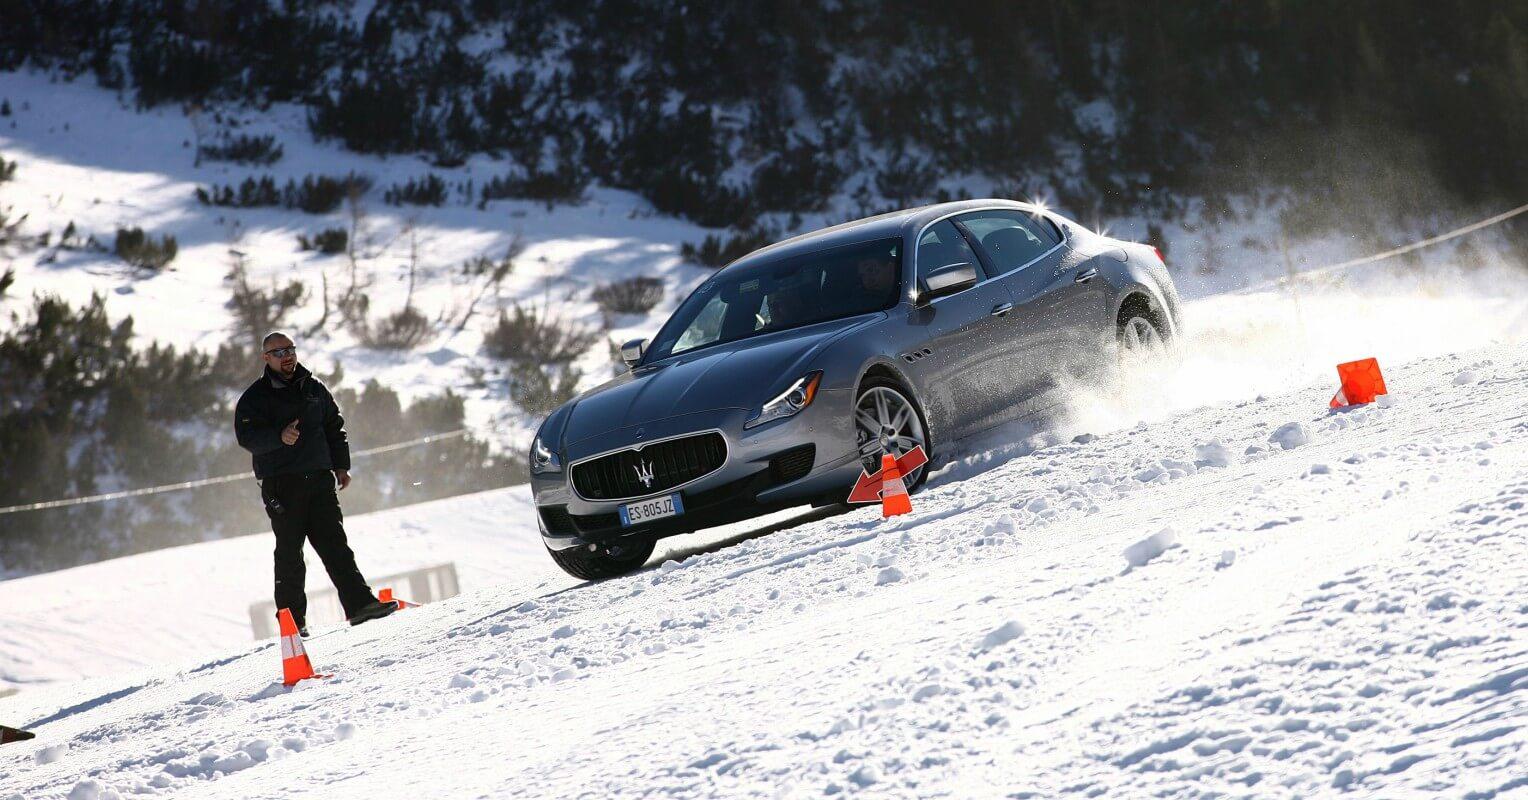 Consejos para conducir sobre nieve